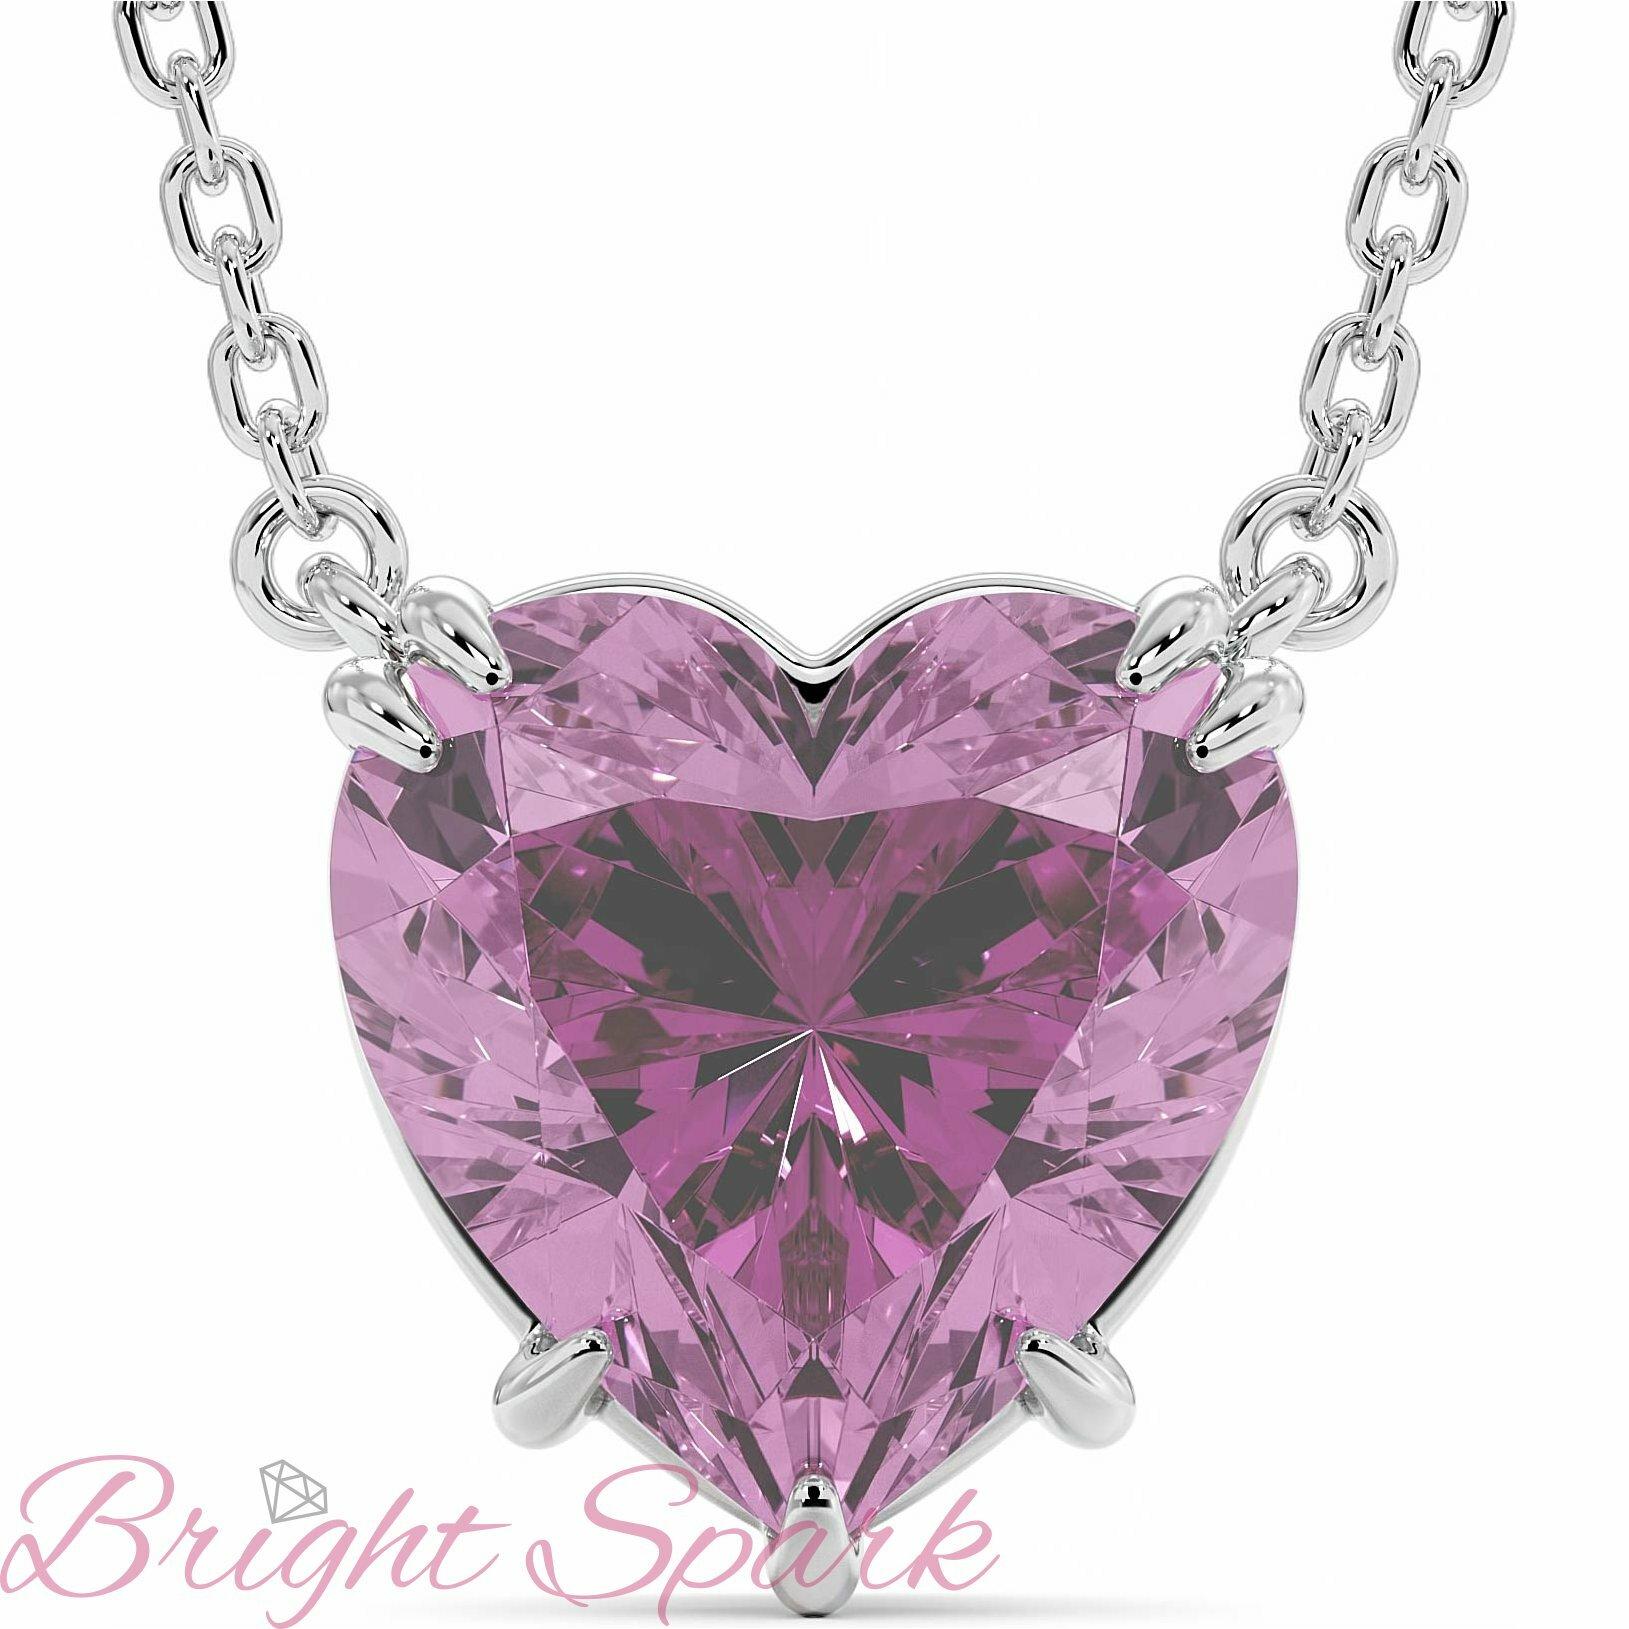 Кулон с розовым сапфиром в виде сердца 3 карата с цепочкой Love